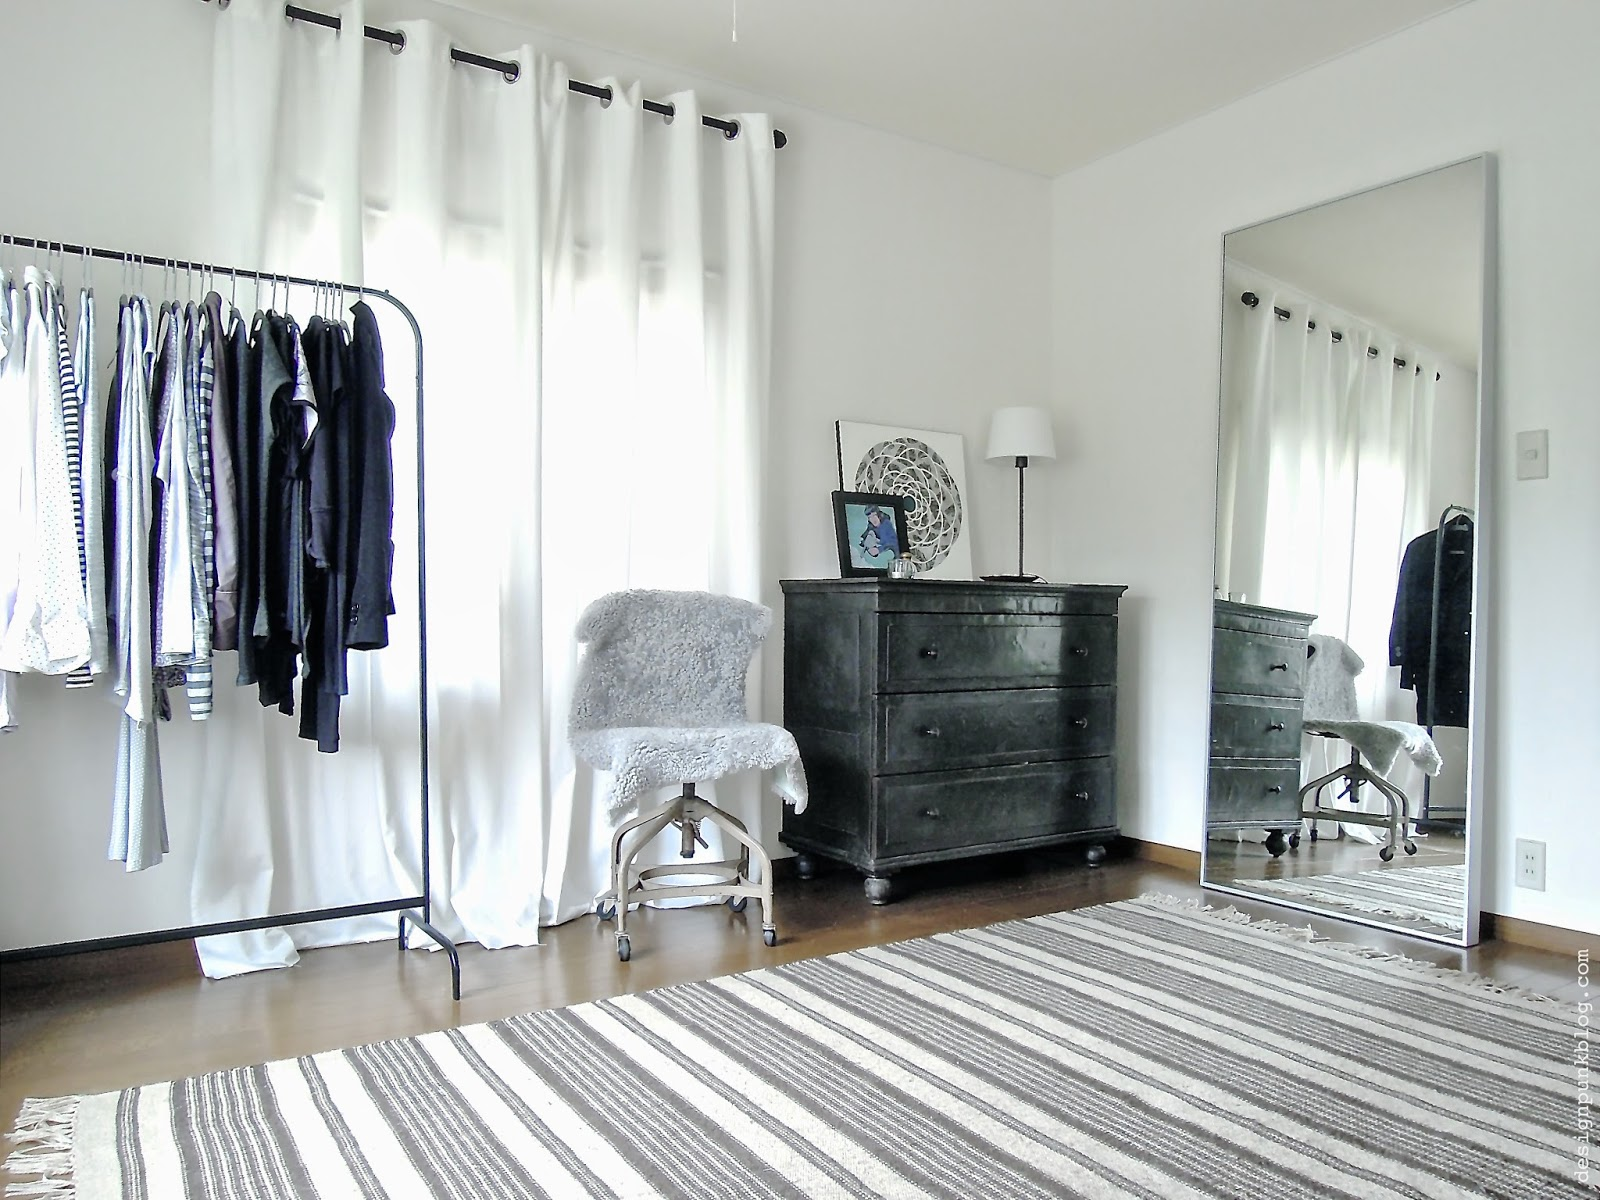 chair cover rental toledo ohio dental brands designpunk this japanese house the bedroom